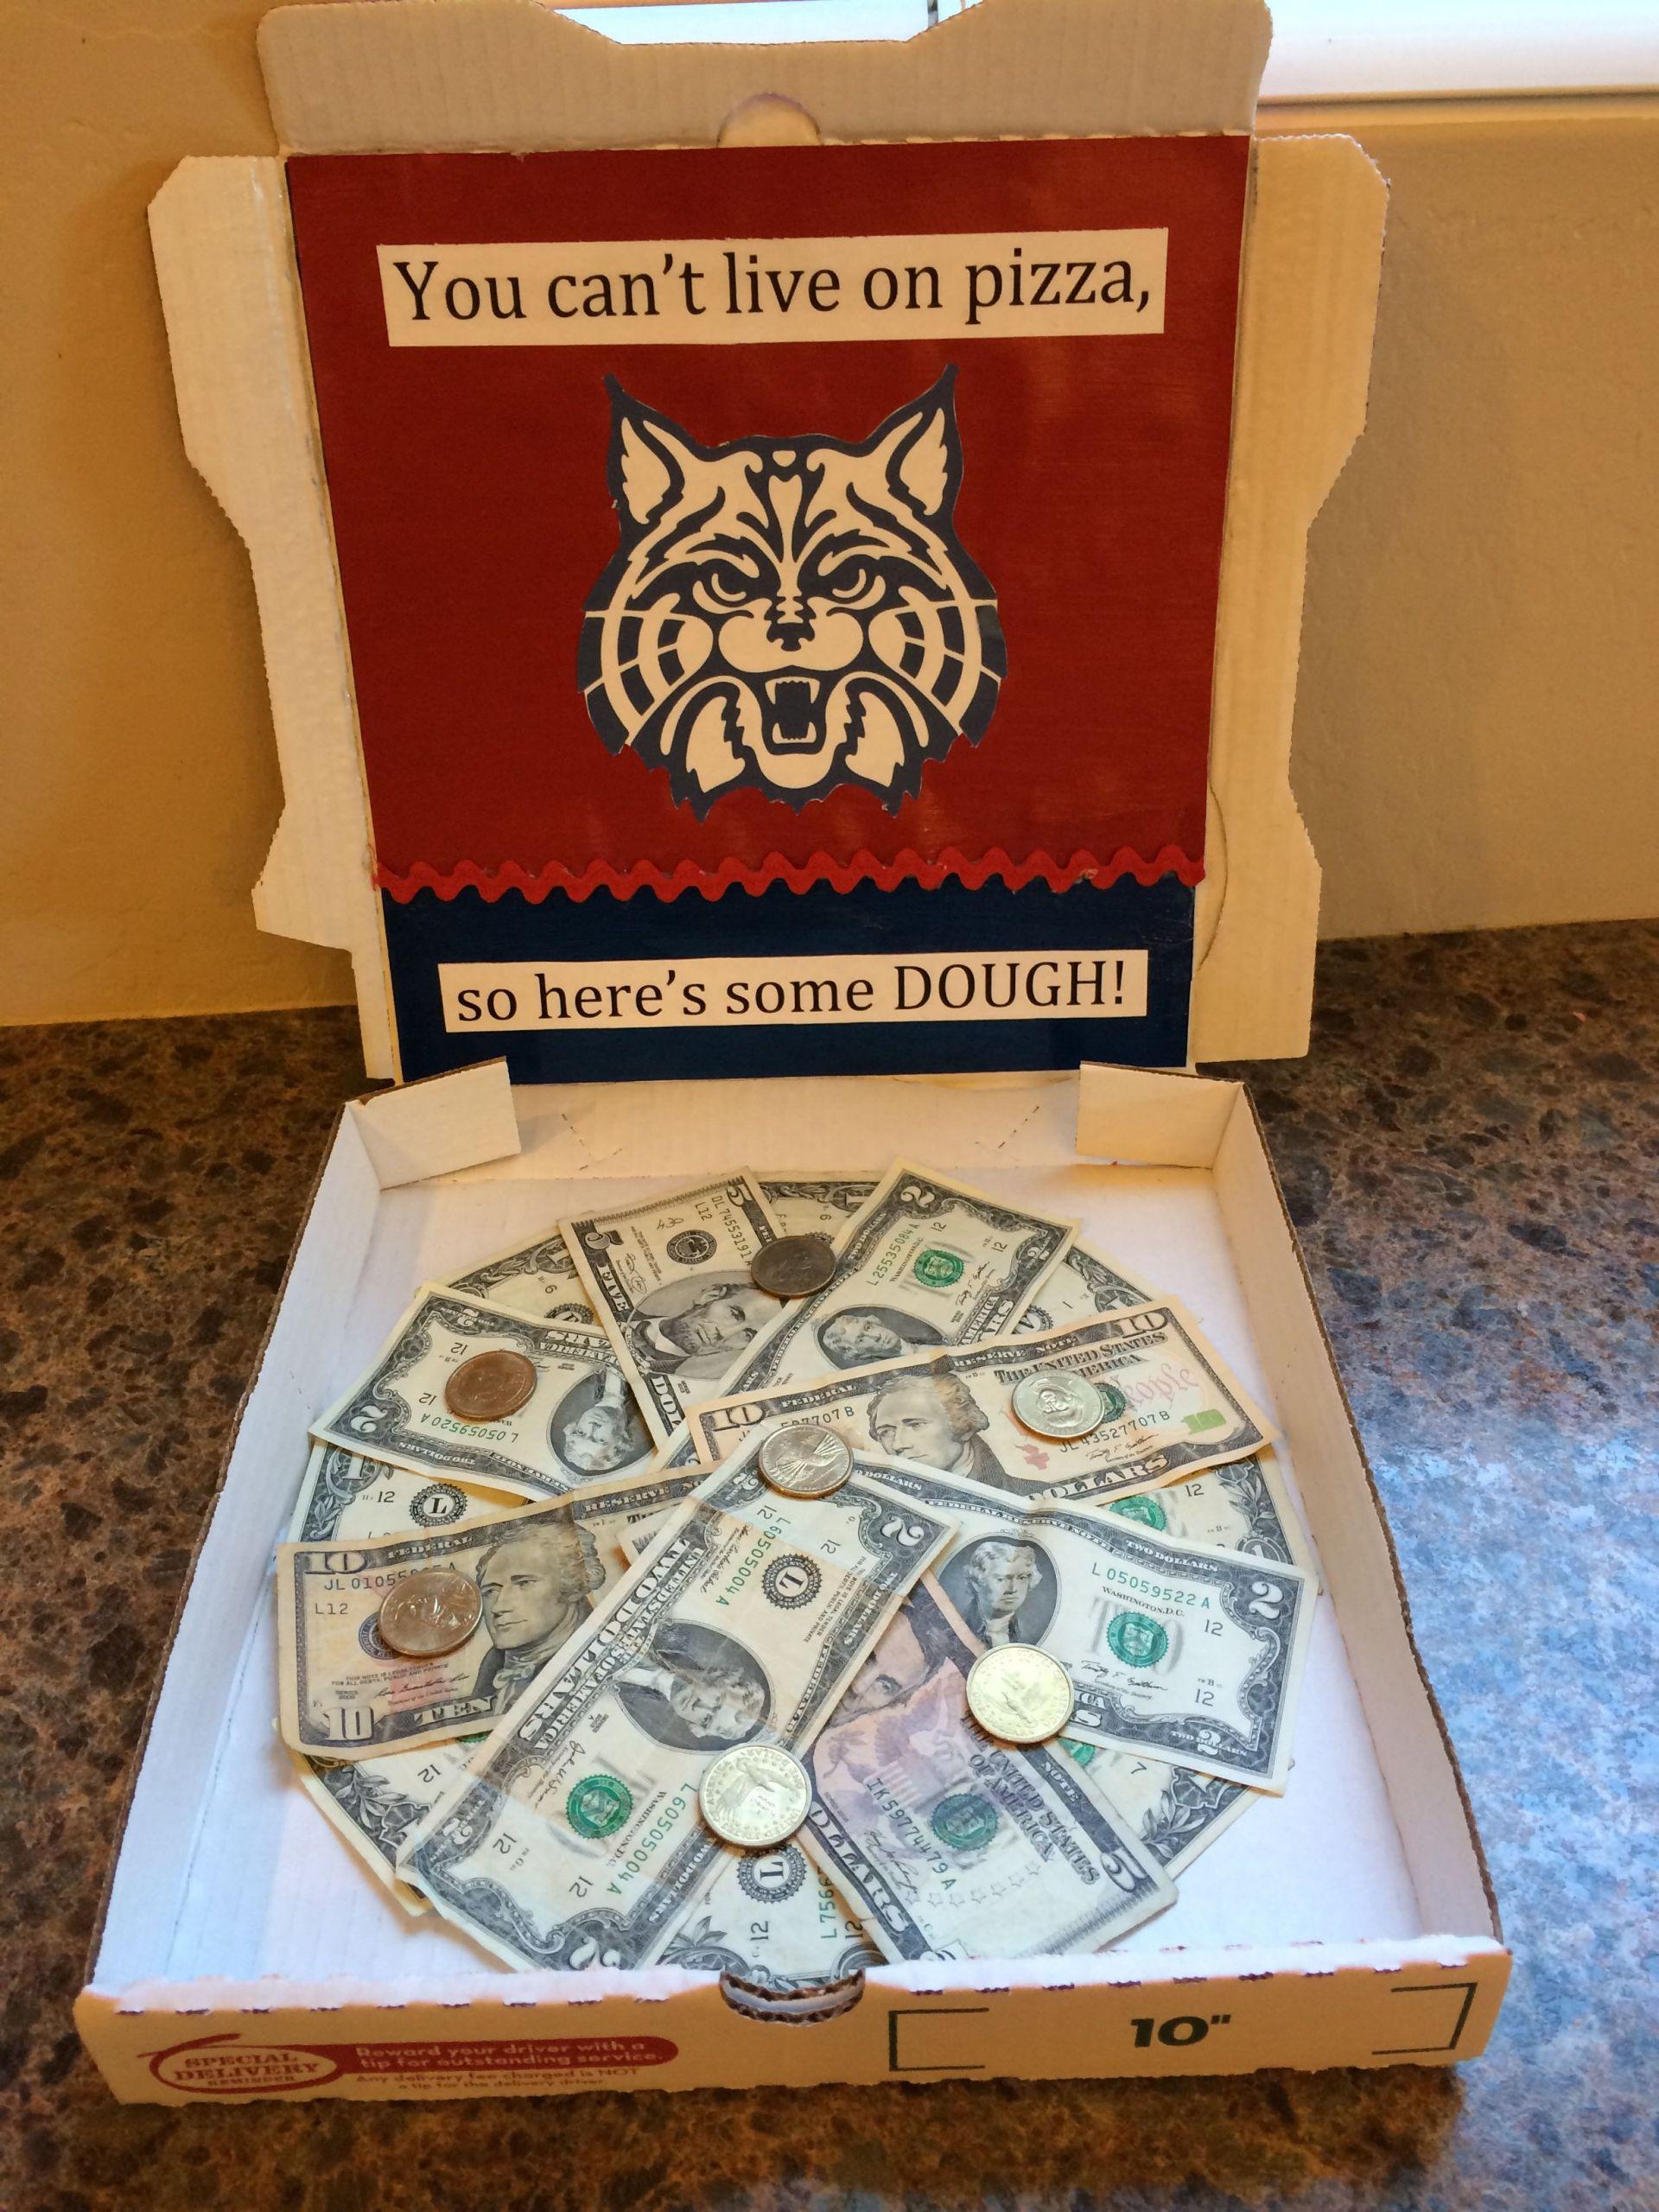 5Th Grade Graduation Gift Ideas For Boys  High School Graduation Gift U of A inspired